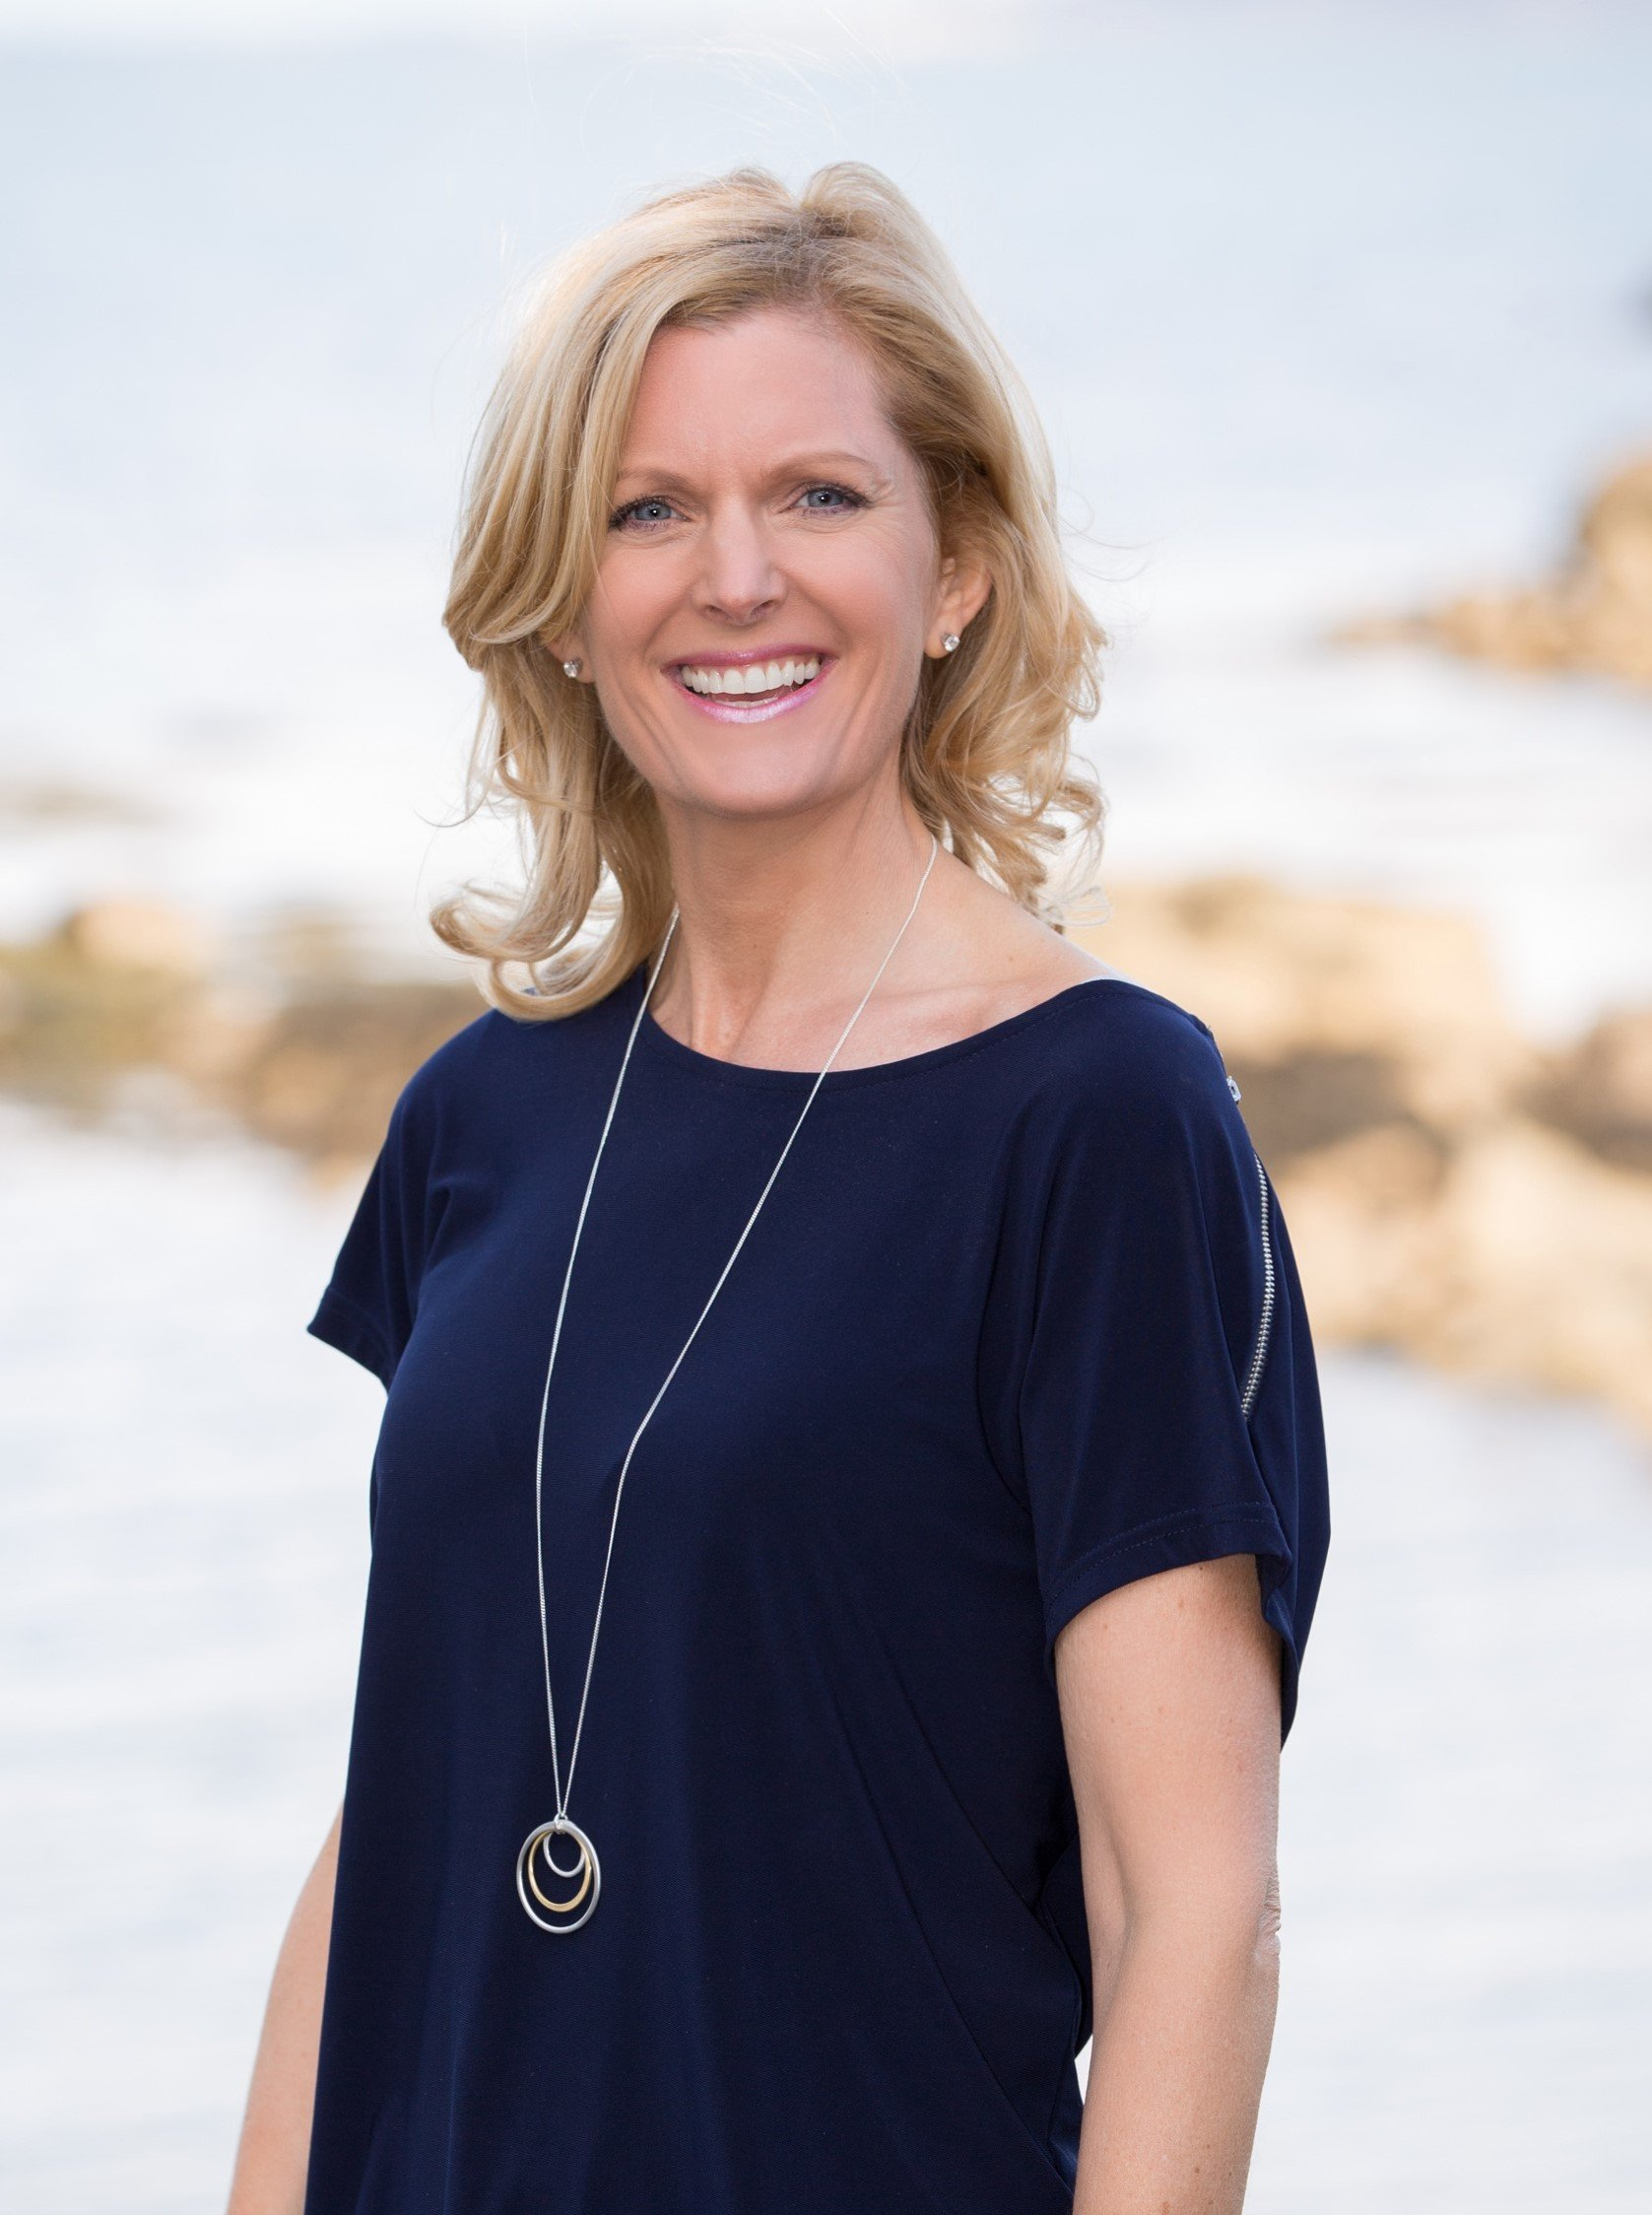 Jill Walker Executive Psychologist & Coach Dublin Ireland life work get success executive coaching clients